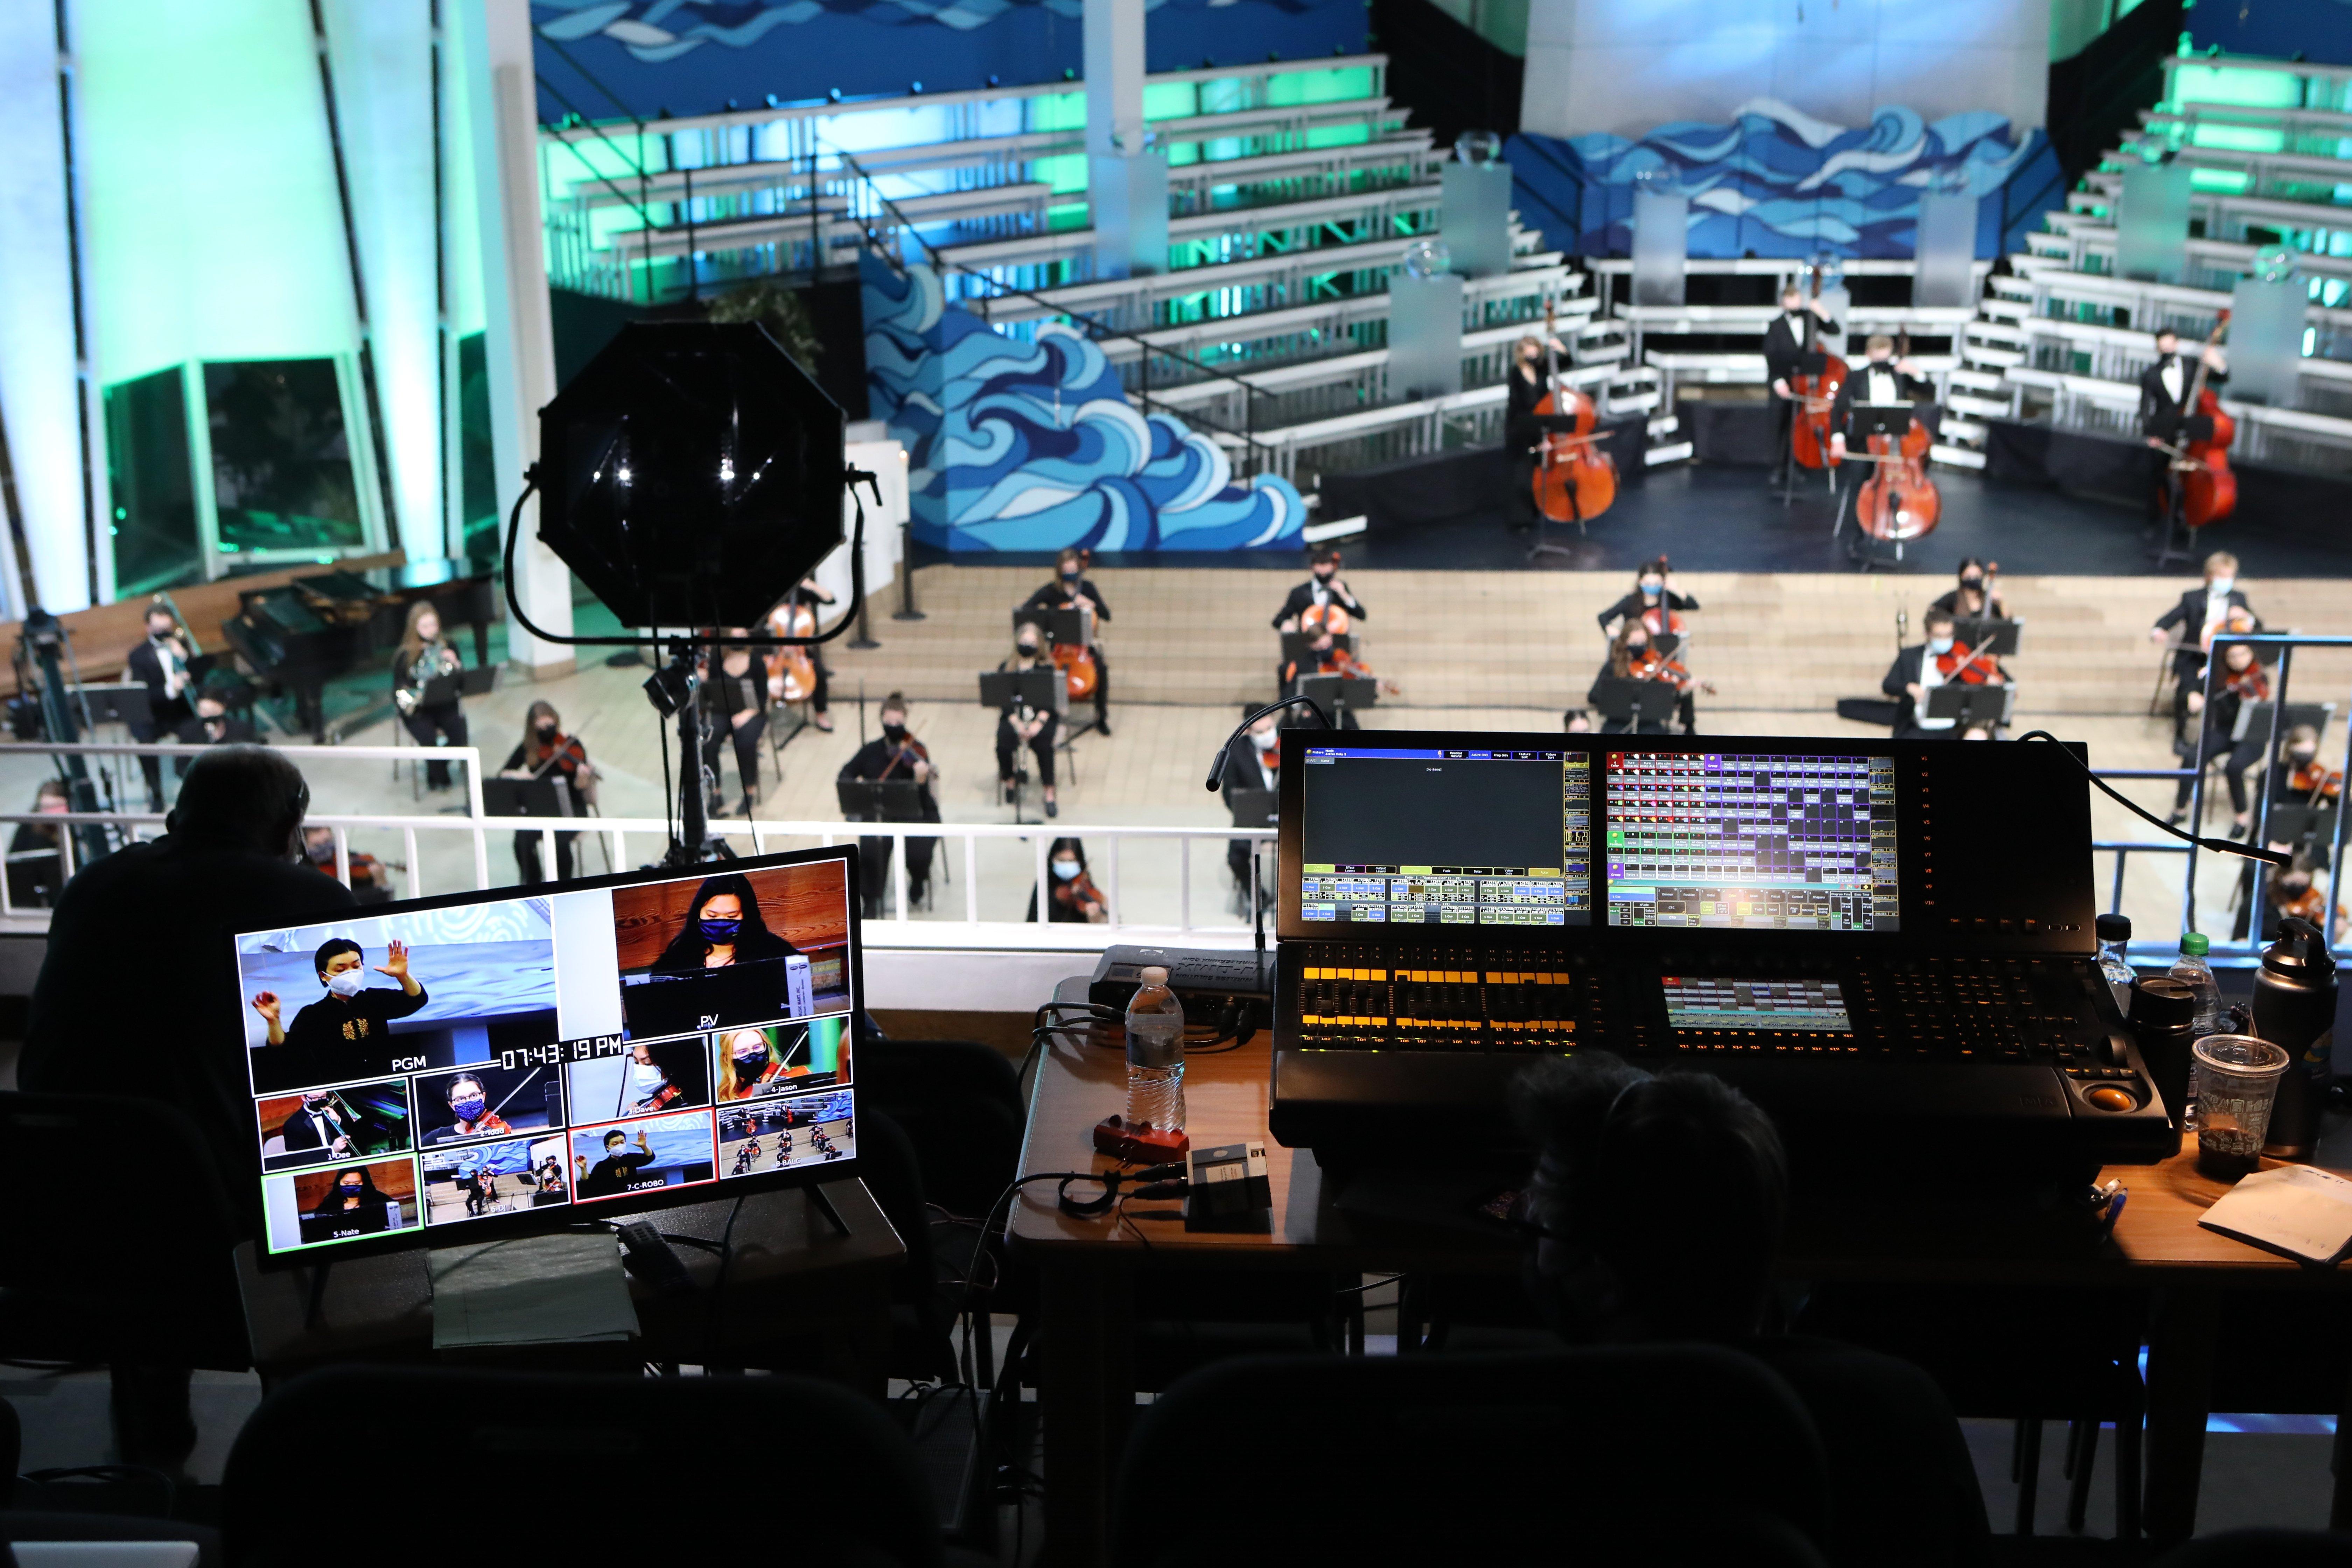 ILEA Best Technical Production - Heroic Gustavus Event